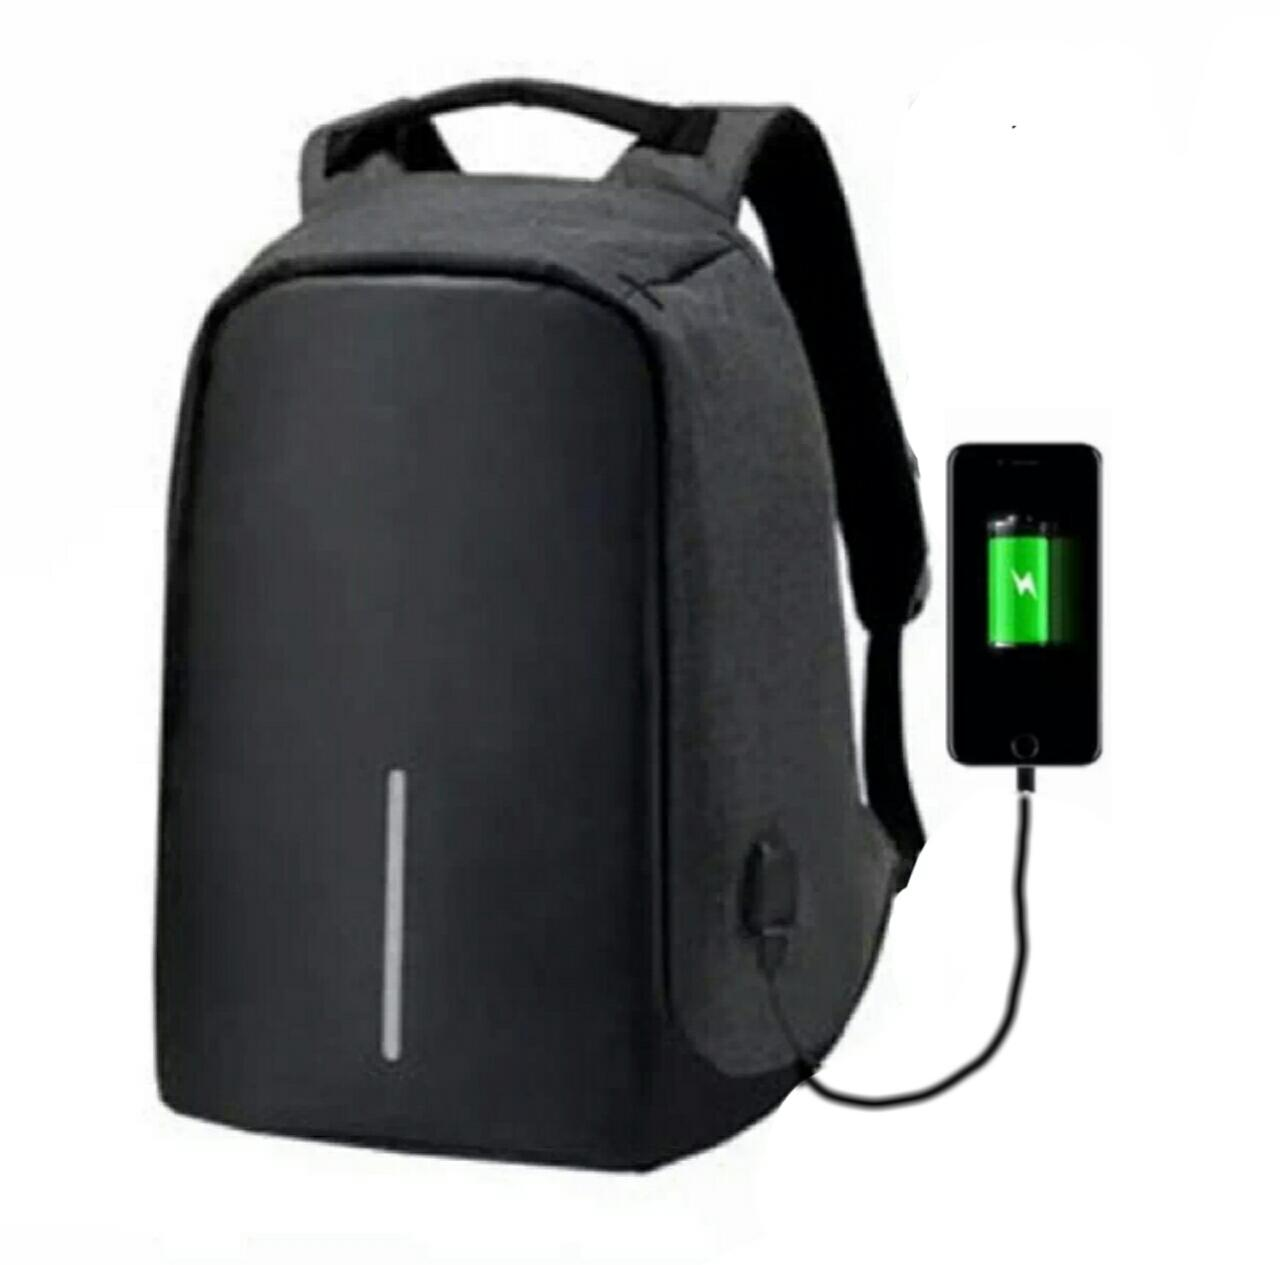 Tas Ransel Tas Pria Tas Wanita Tas kerja Tas kuliah Tas Sekolah Tas Anti Maling USB port charger Tas laptop